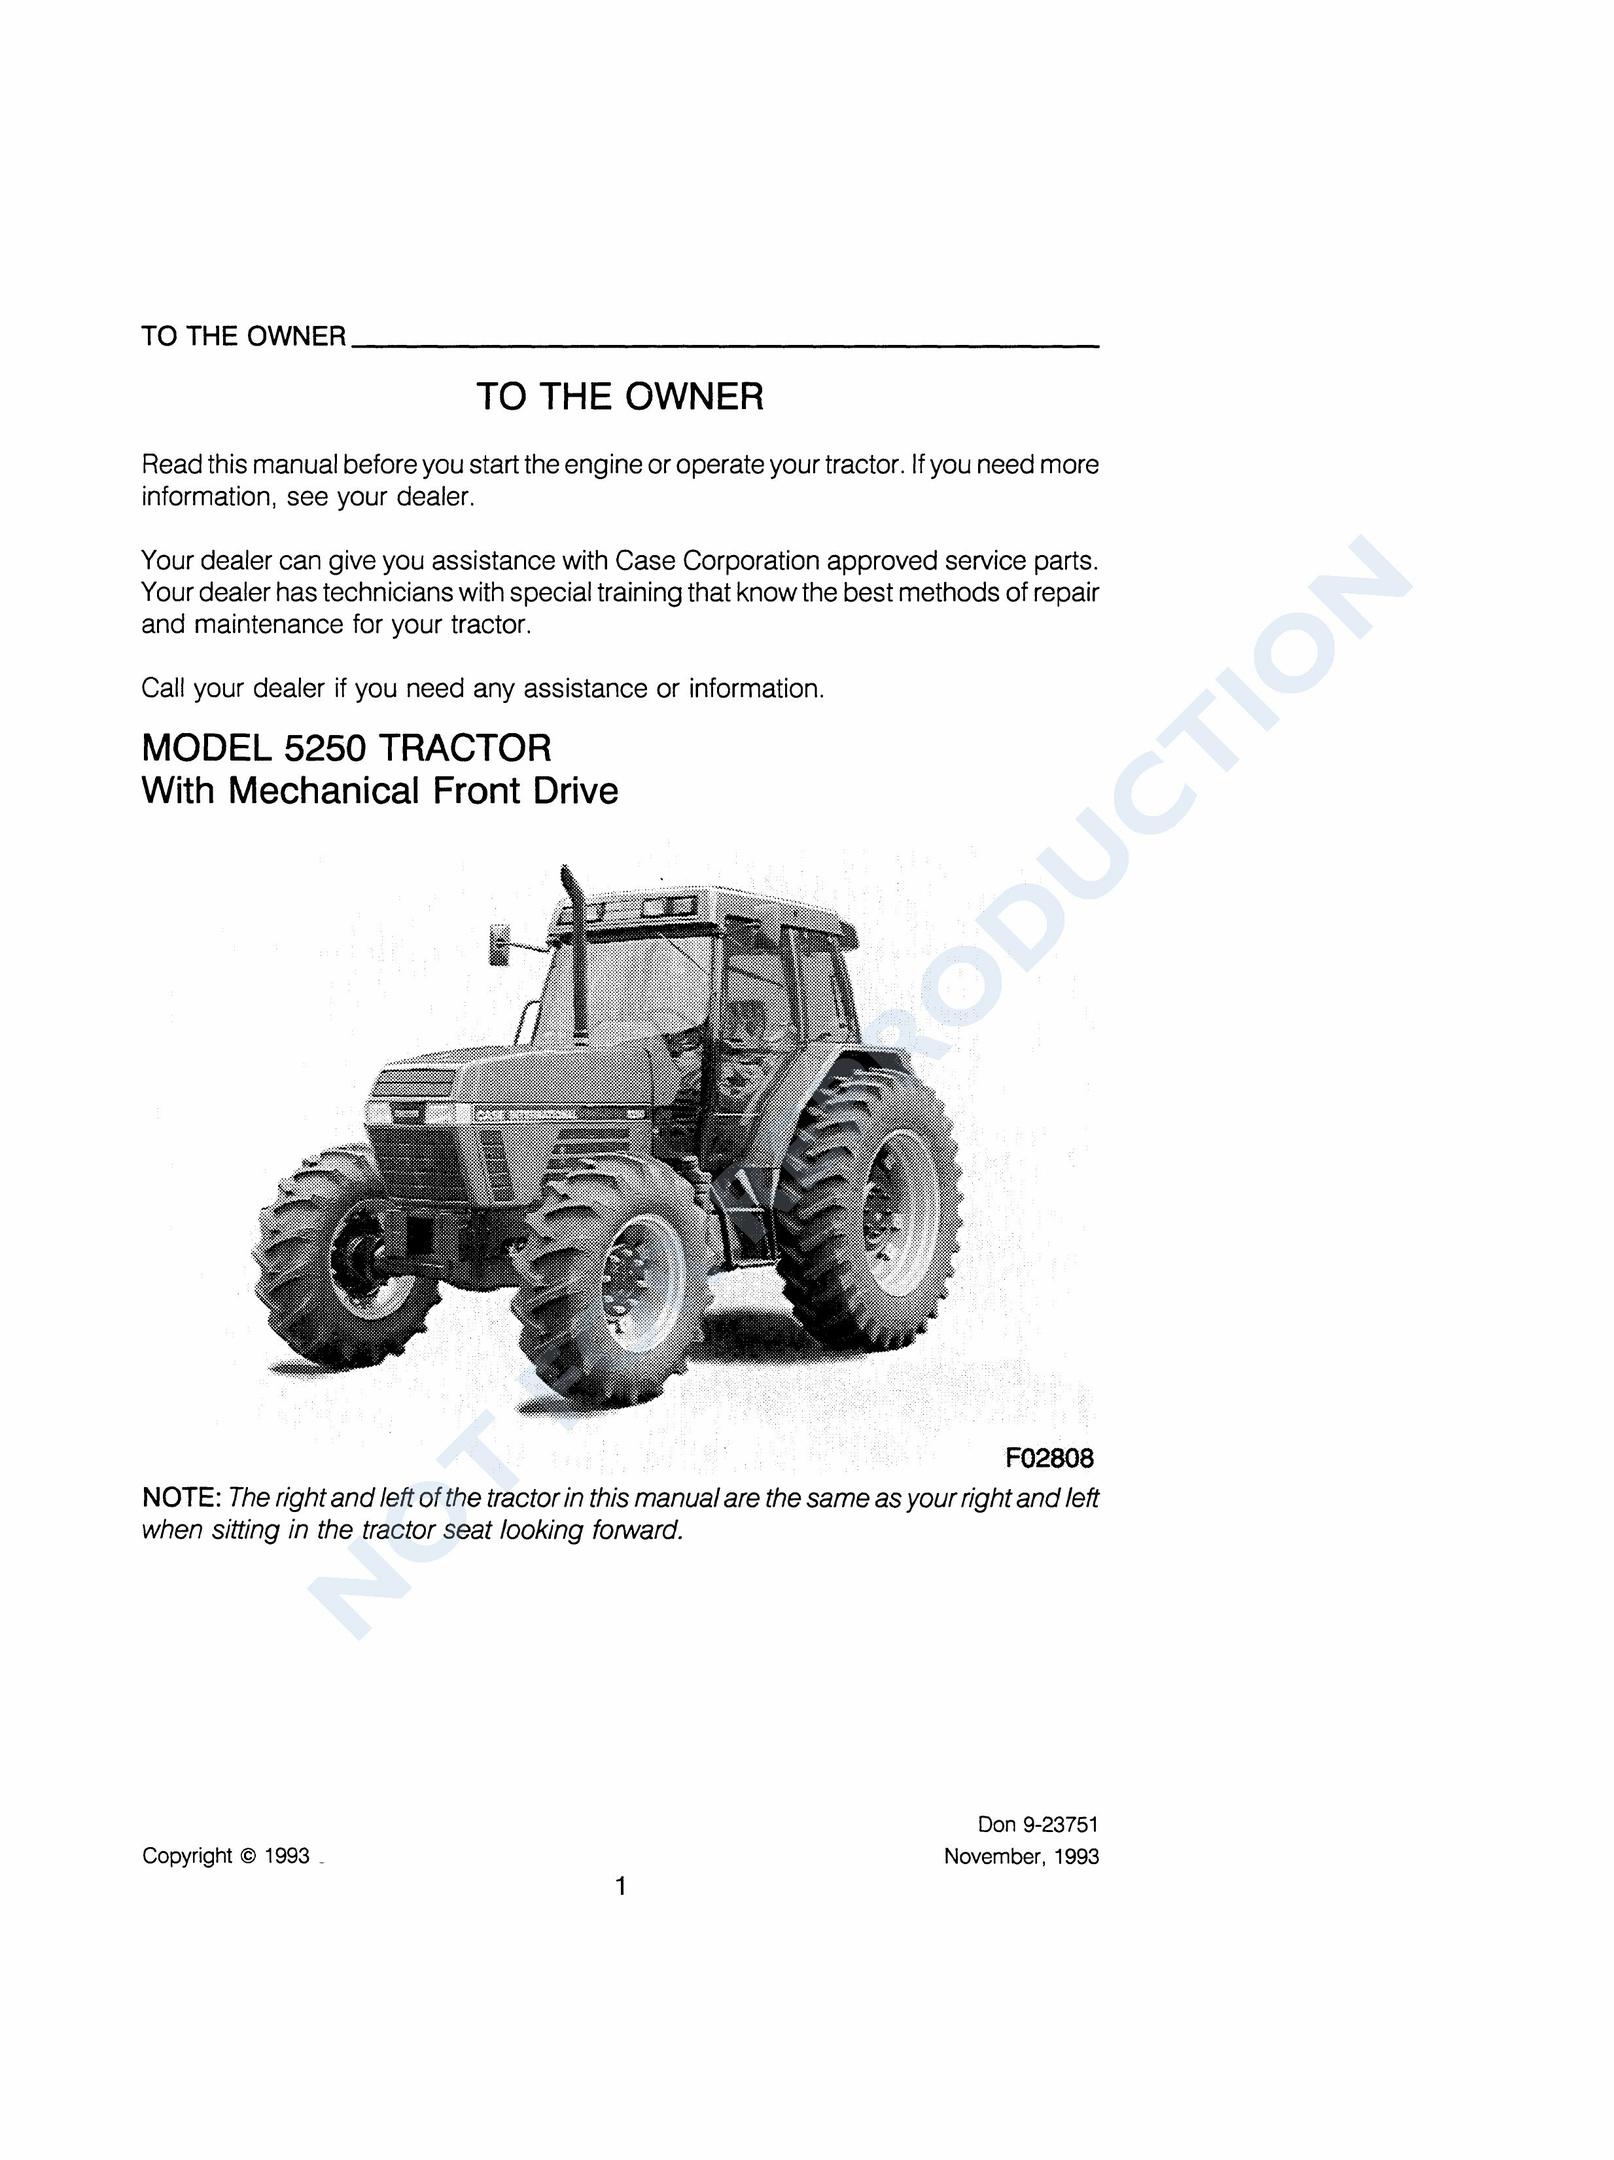 Farmall 560 Tractor Wiring Diagram On Wiring Diagram For Farmall 706